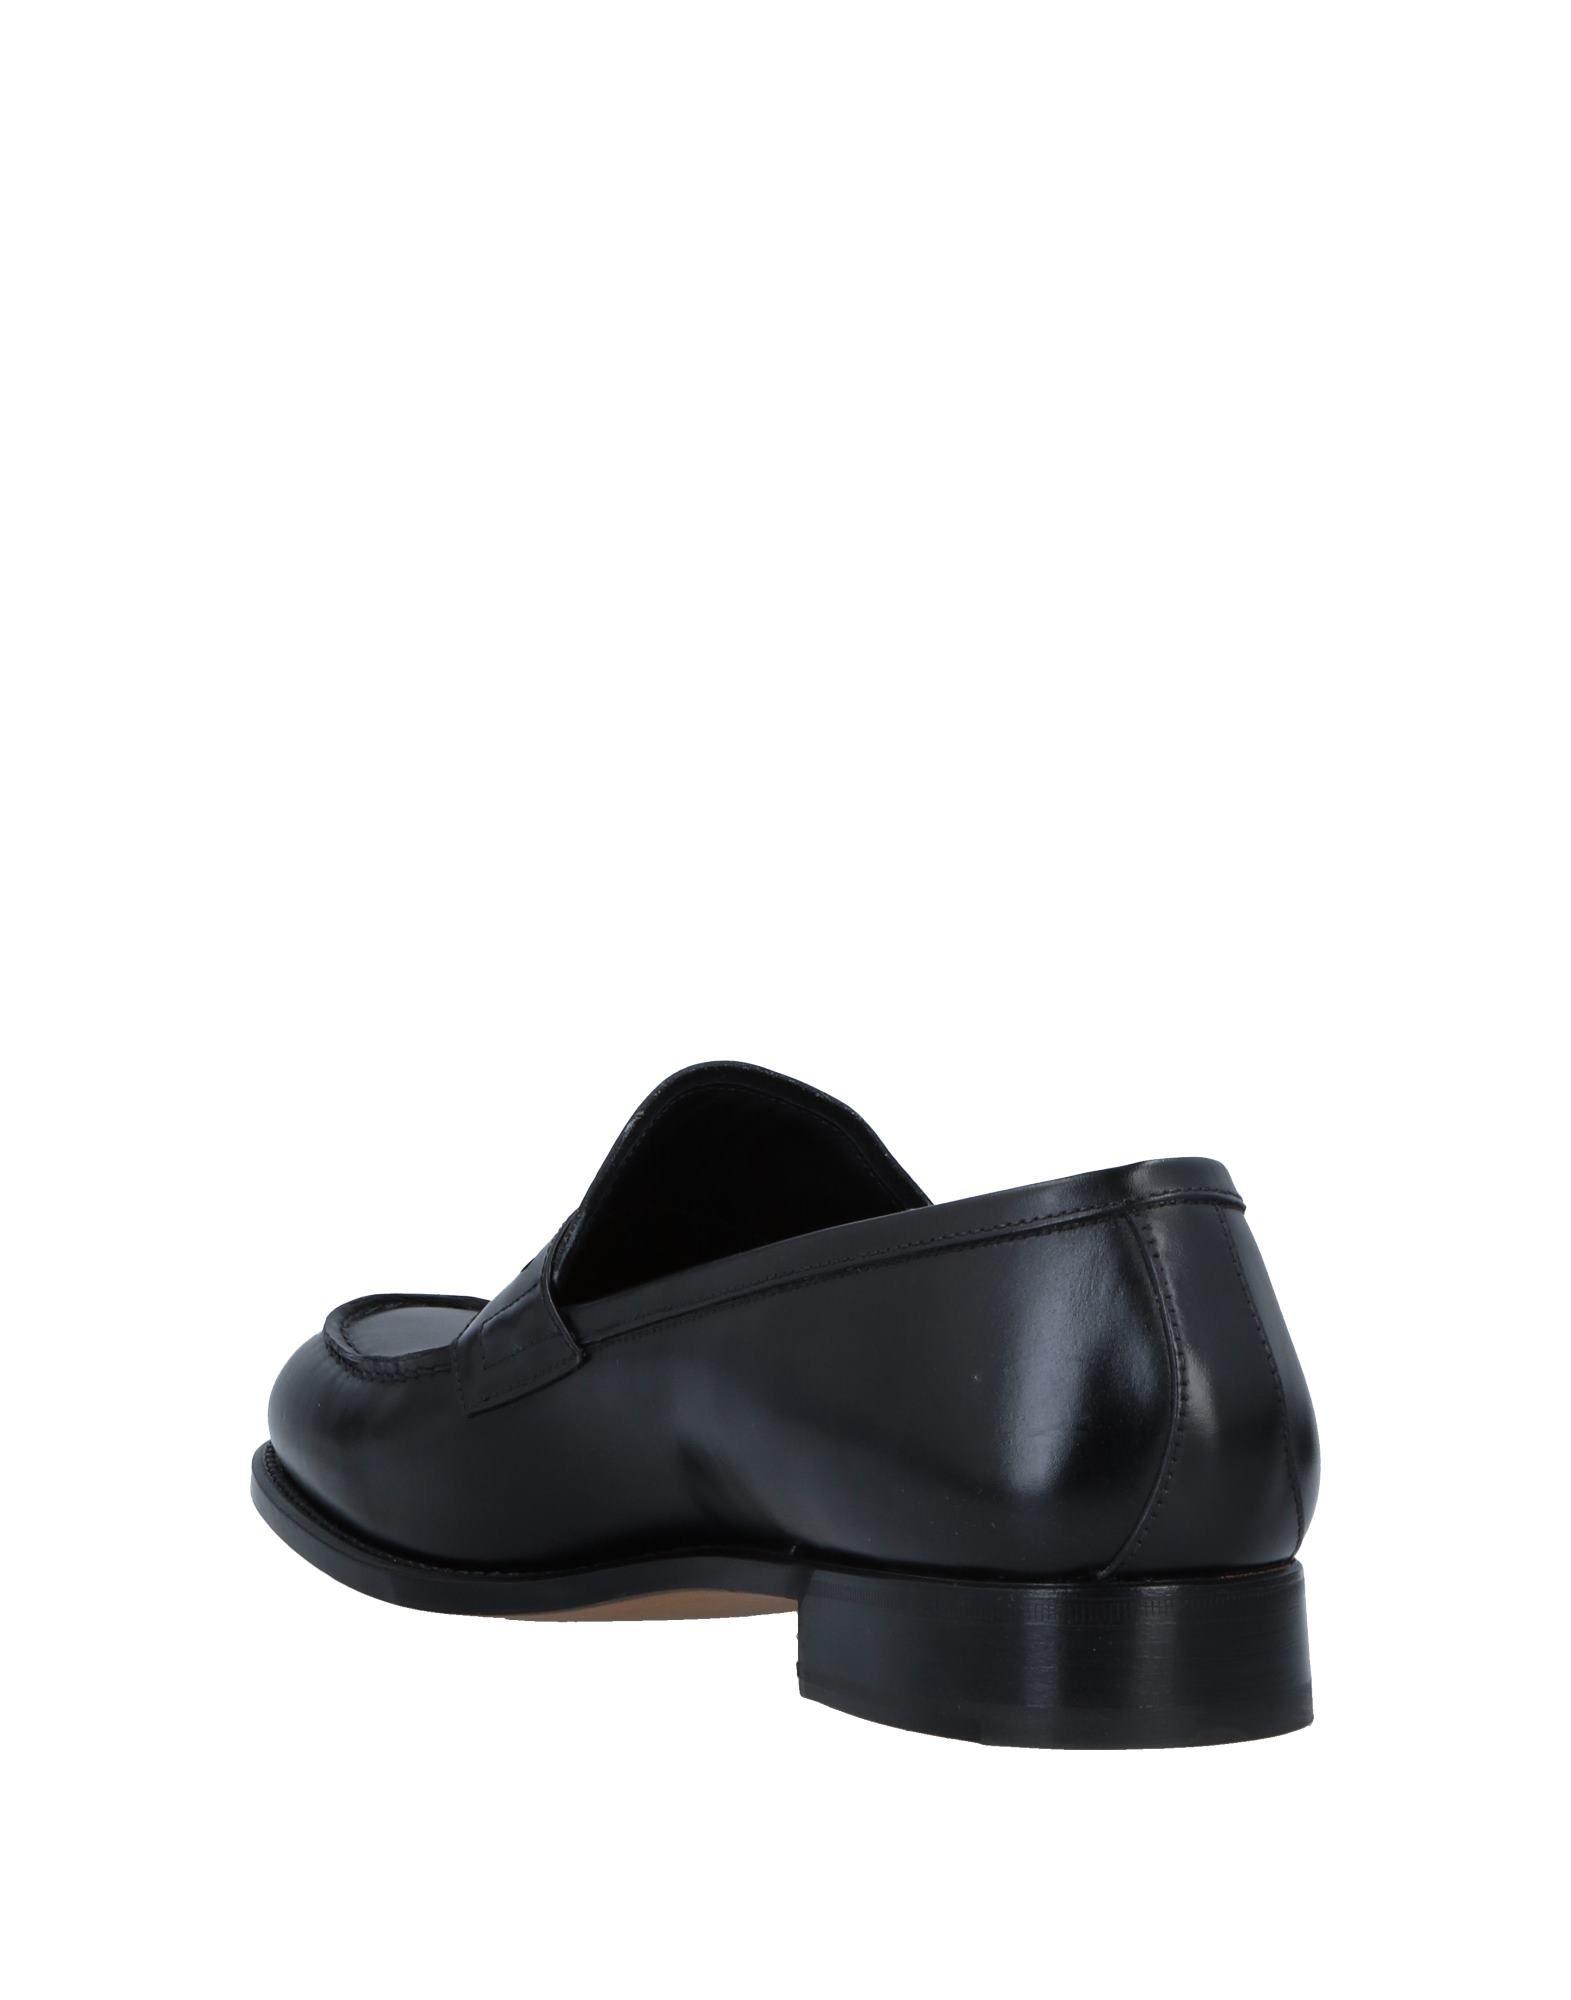 Campanile Mokassins Herren  Schuhe 11523257SB Gute Qualität beliebte Schuhe  b8b932